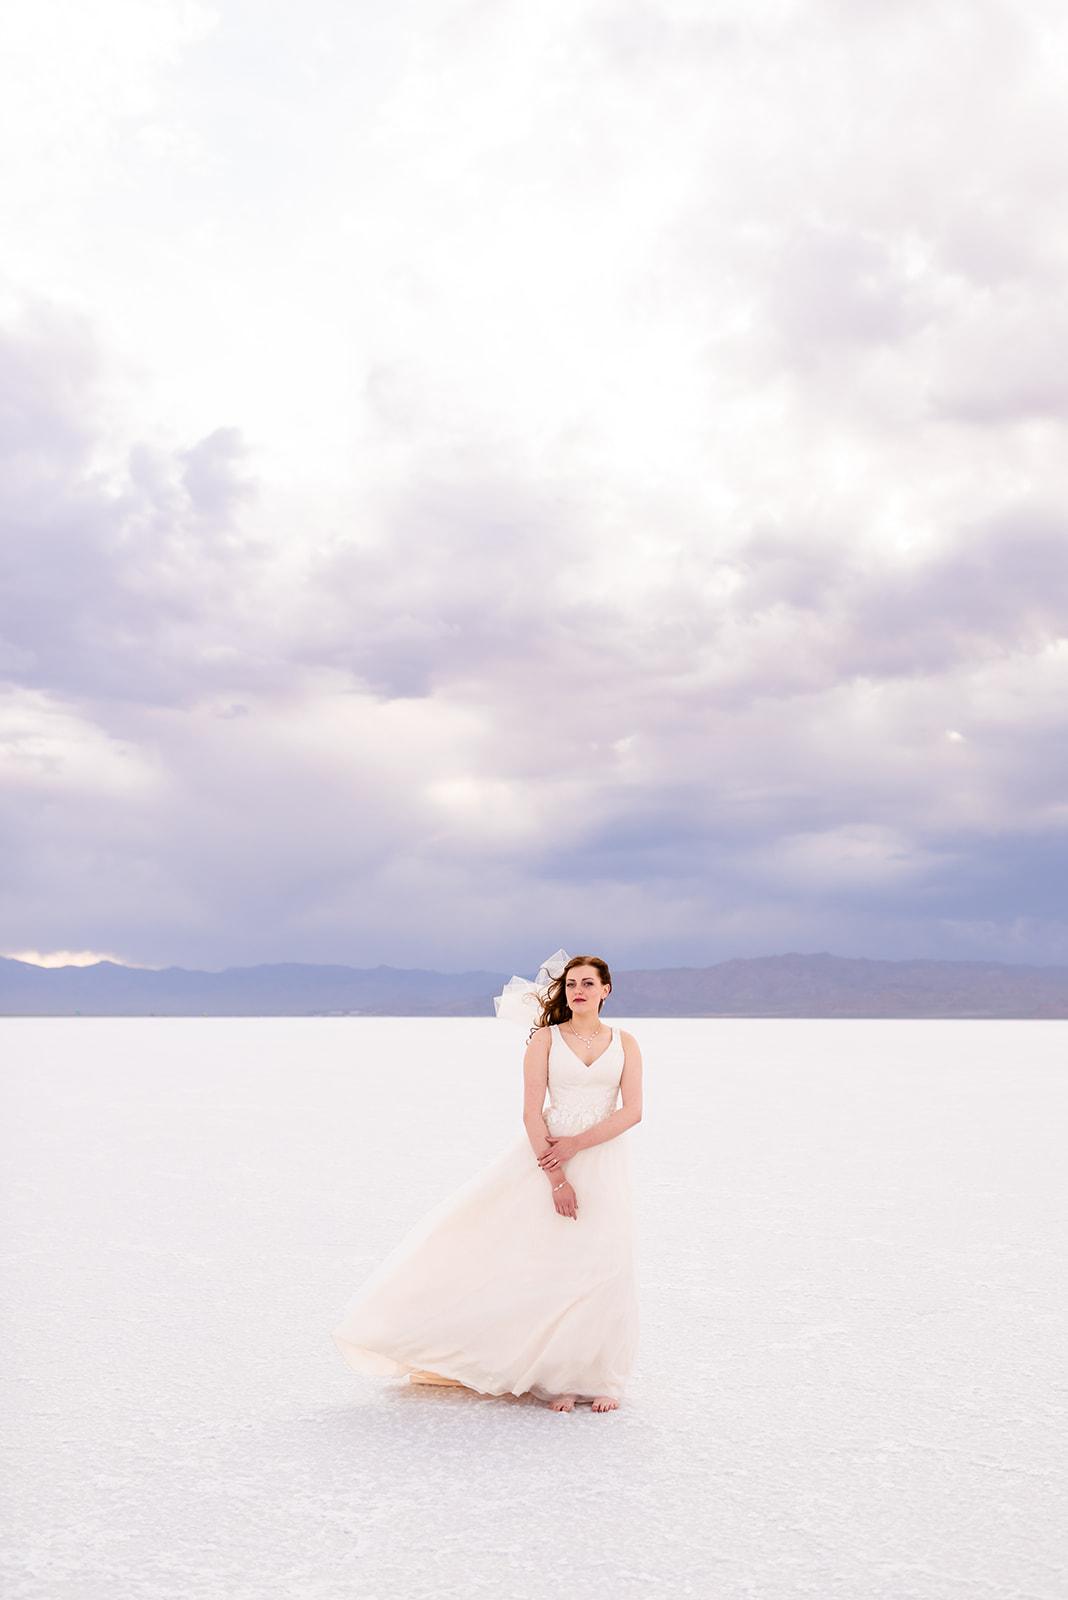 Romantic bridal portrait of Adri at the Bonneville Salt Falts in Utah. Taken by Coley Cook Photography.